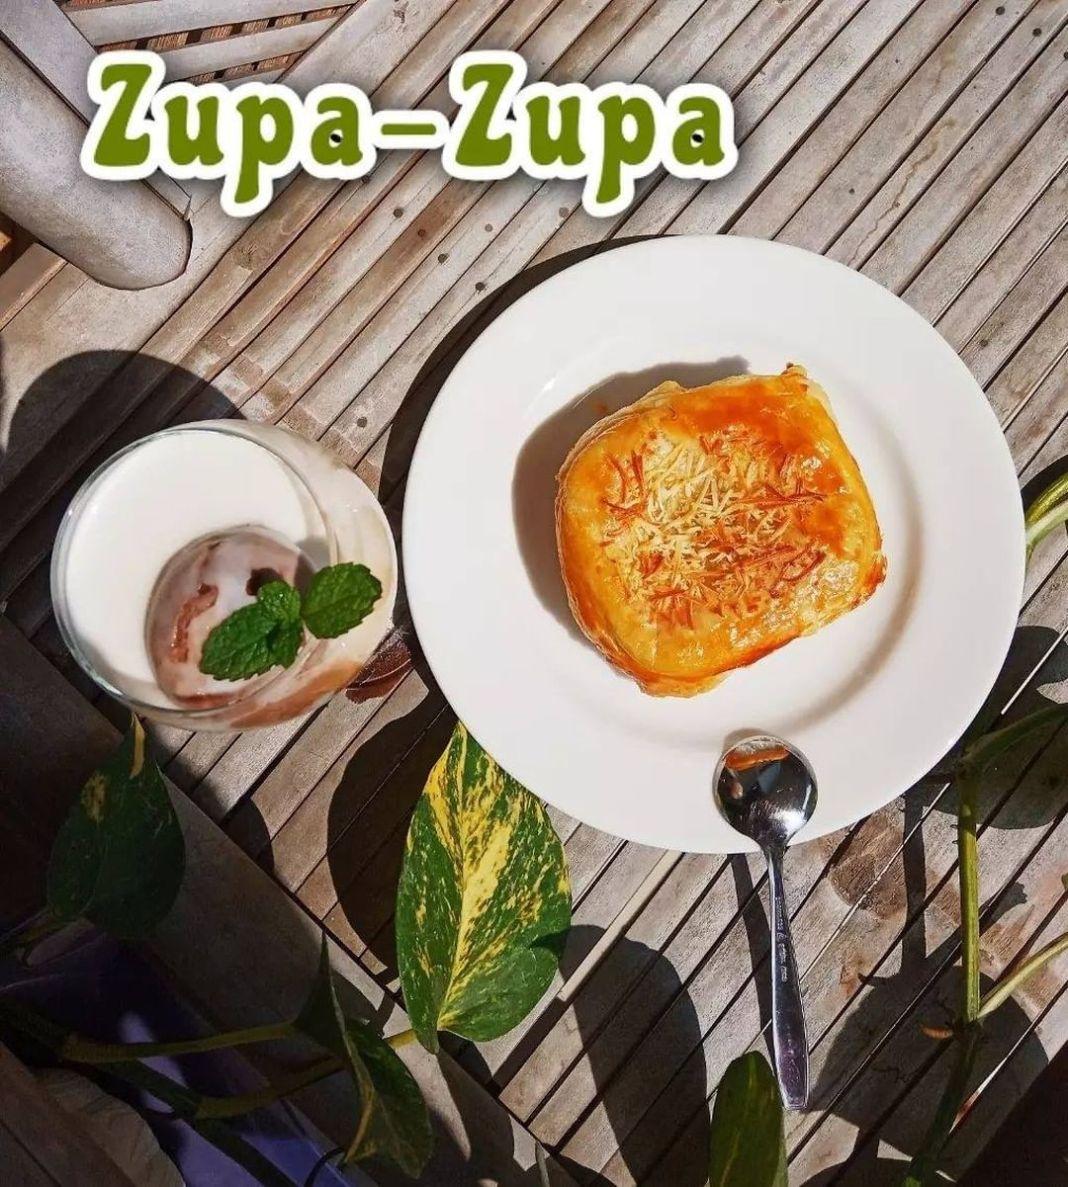 Info kuliner, siapa nih pecinta zuppa soup??? yukkk dicoba bikin!  Bahan 'Zupa-zupa' : Kulit zupa-zupa/ puff …